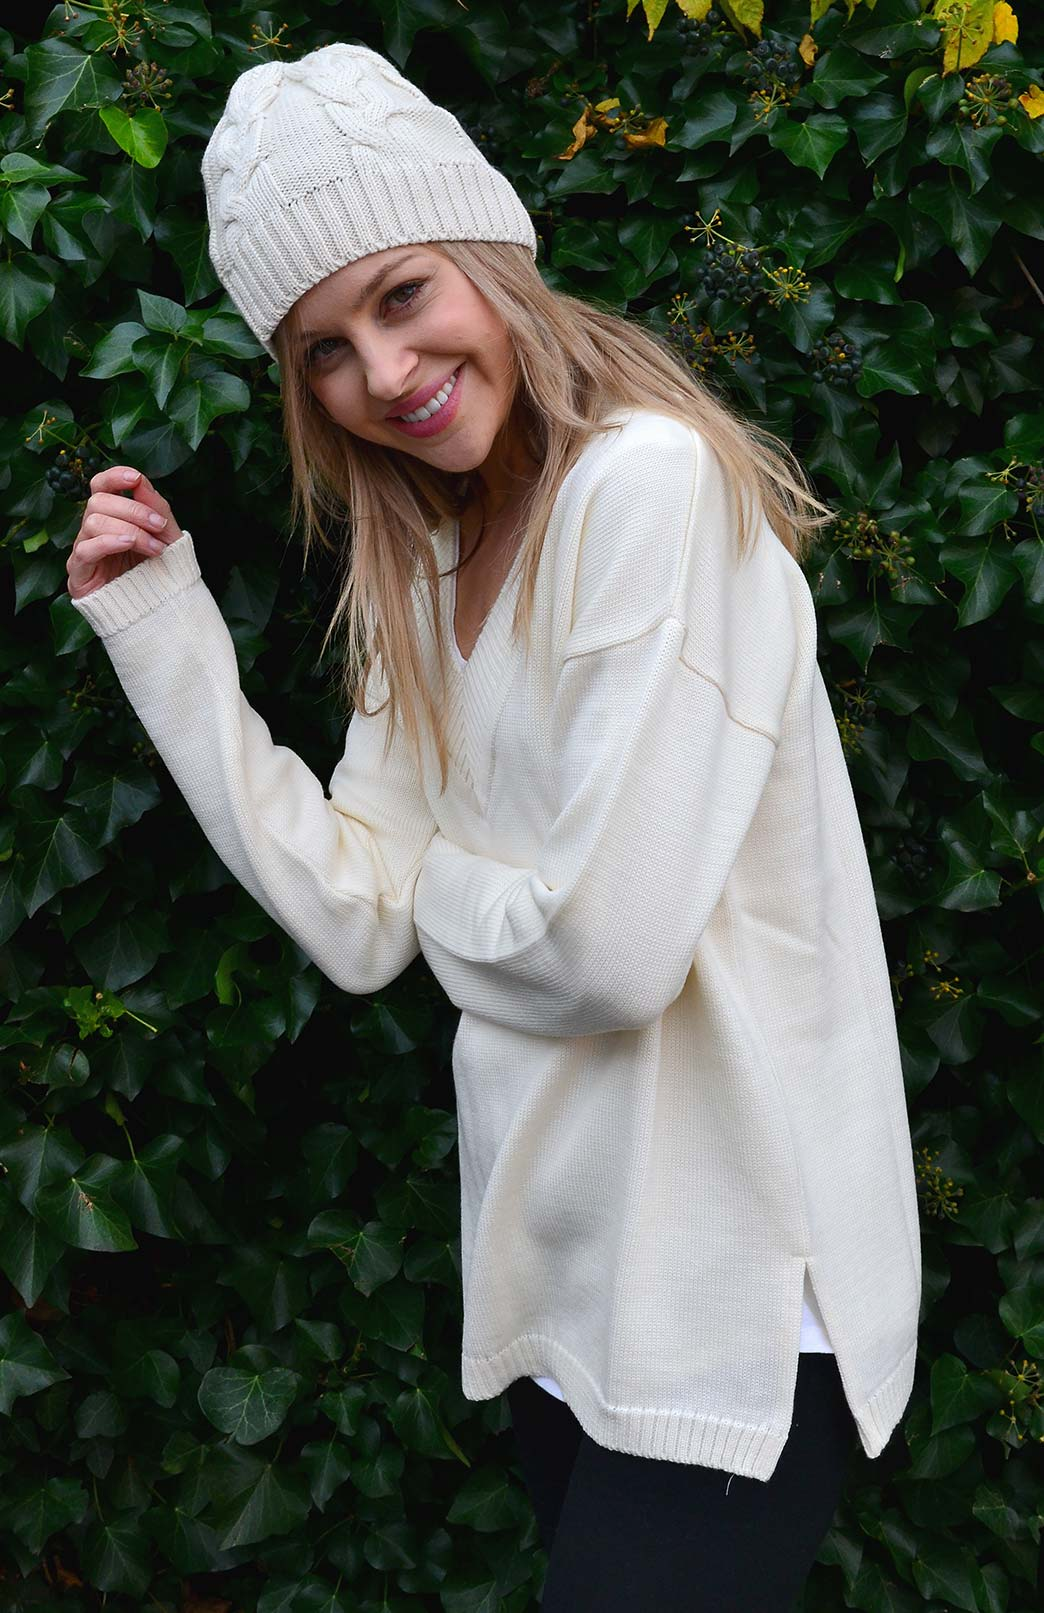 V-Neck Sweater - Women's Cream V-Neck Chunky Knit Merino Wool Sweater with side splits - Smitten Merino Tasmania Australia